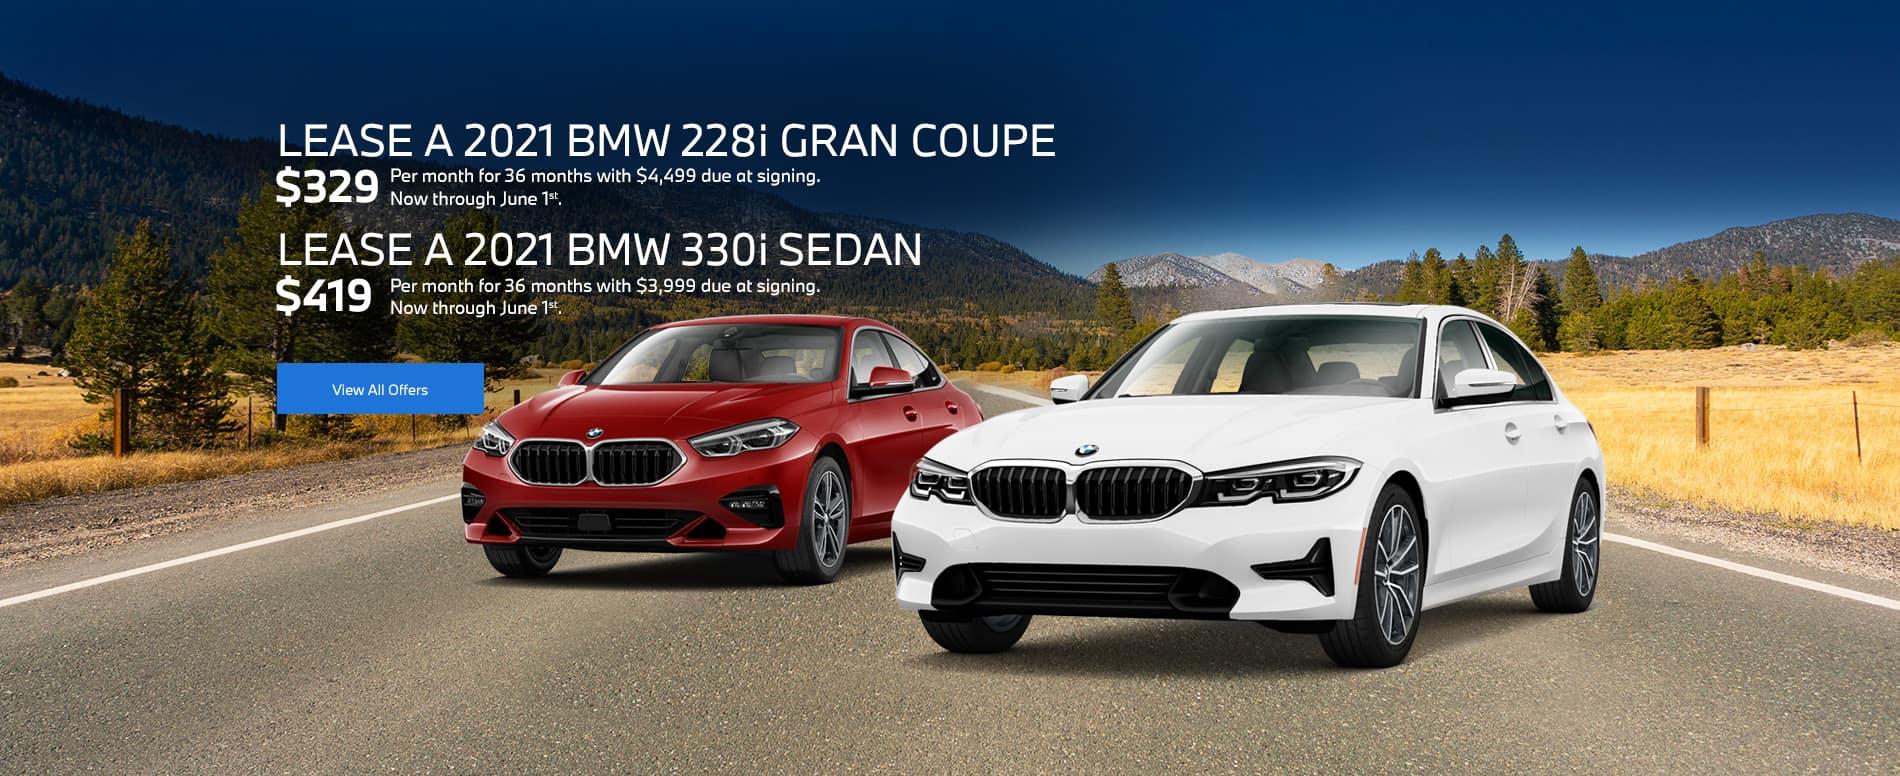 2021 BMW 228i and 2021 BMW 330i